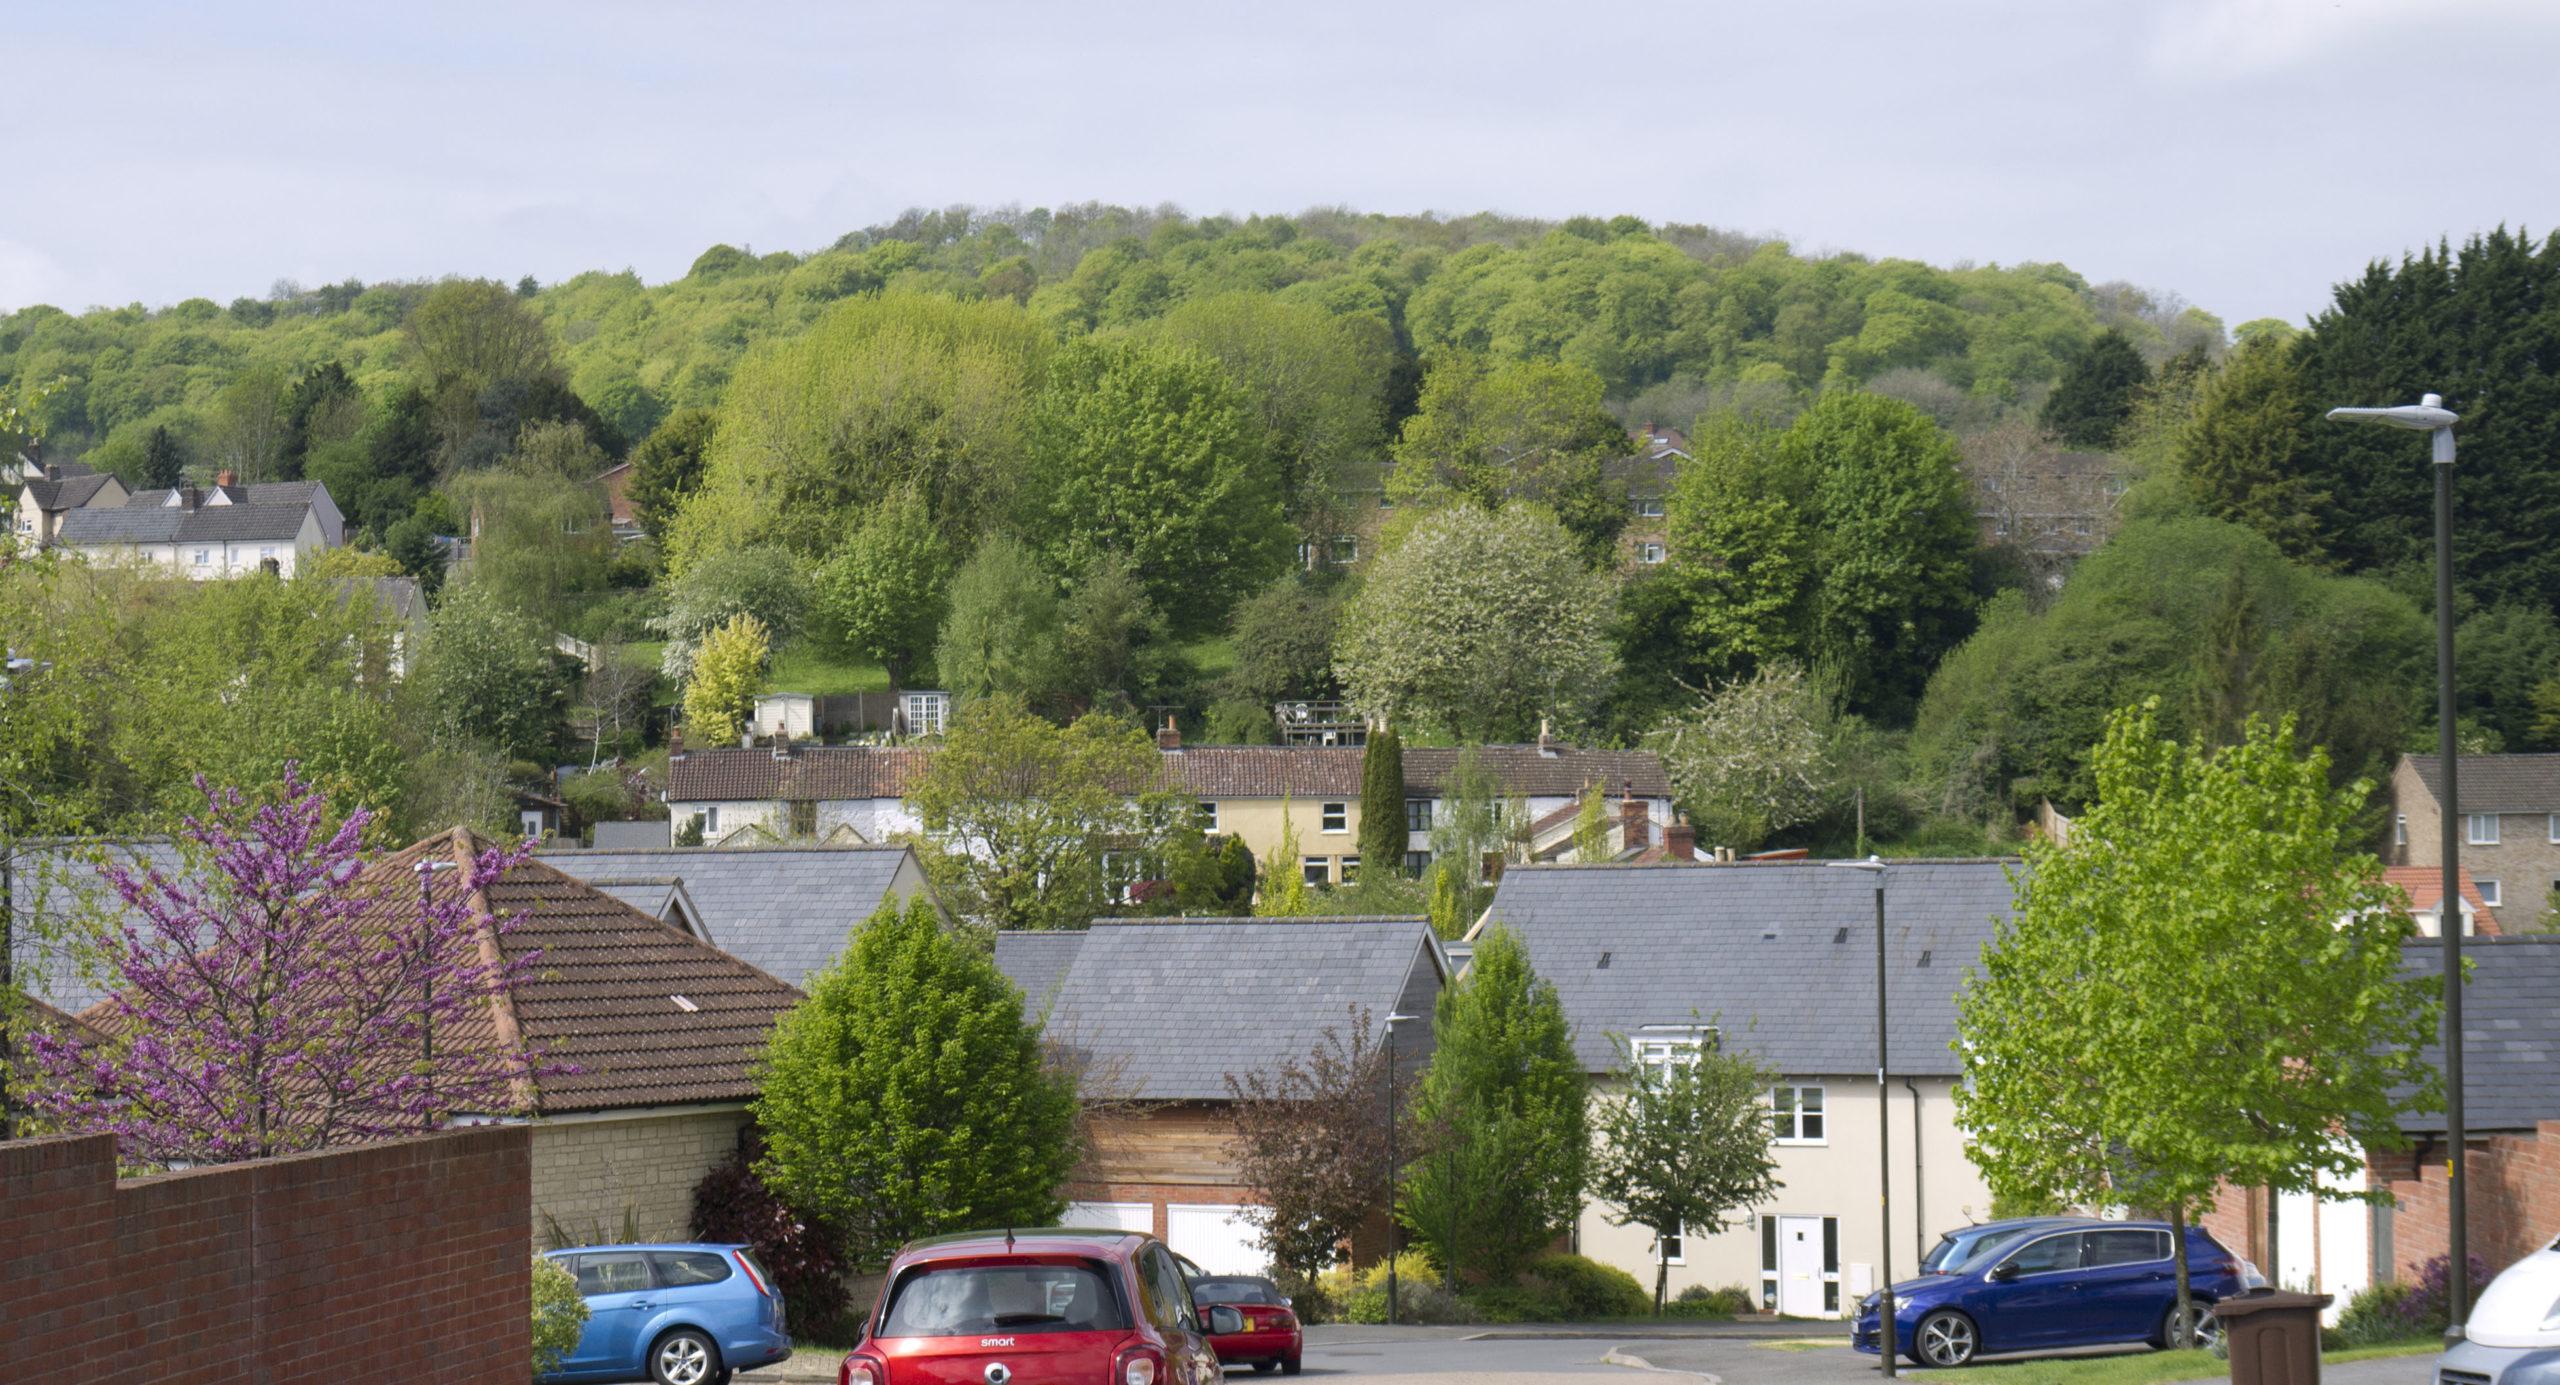 Enhancing Tree Coverage through a Neighbourhood Plan